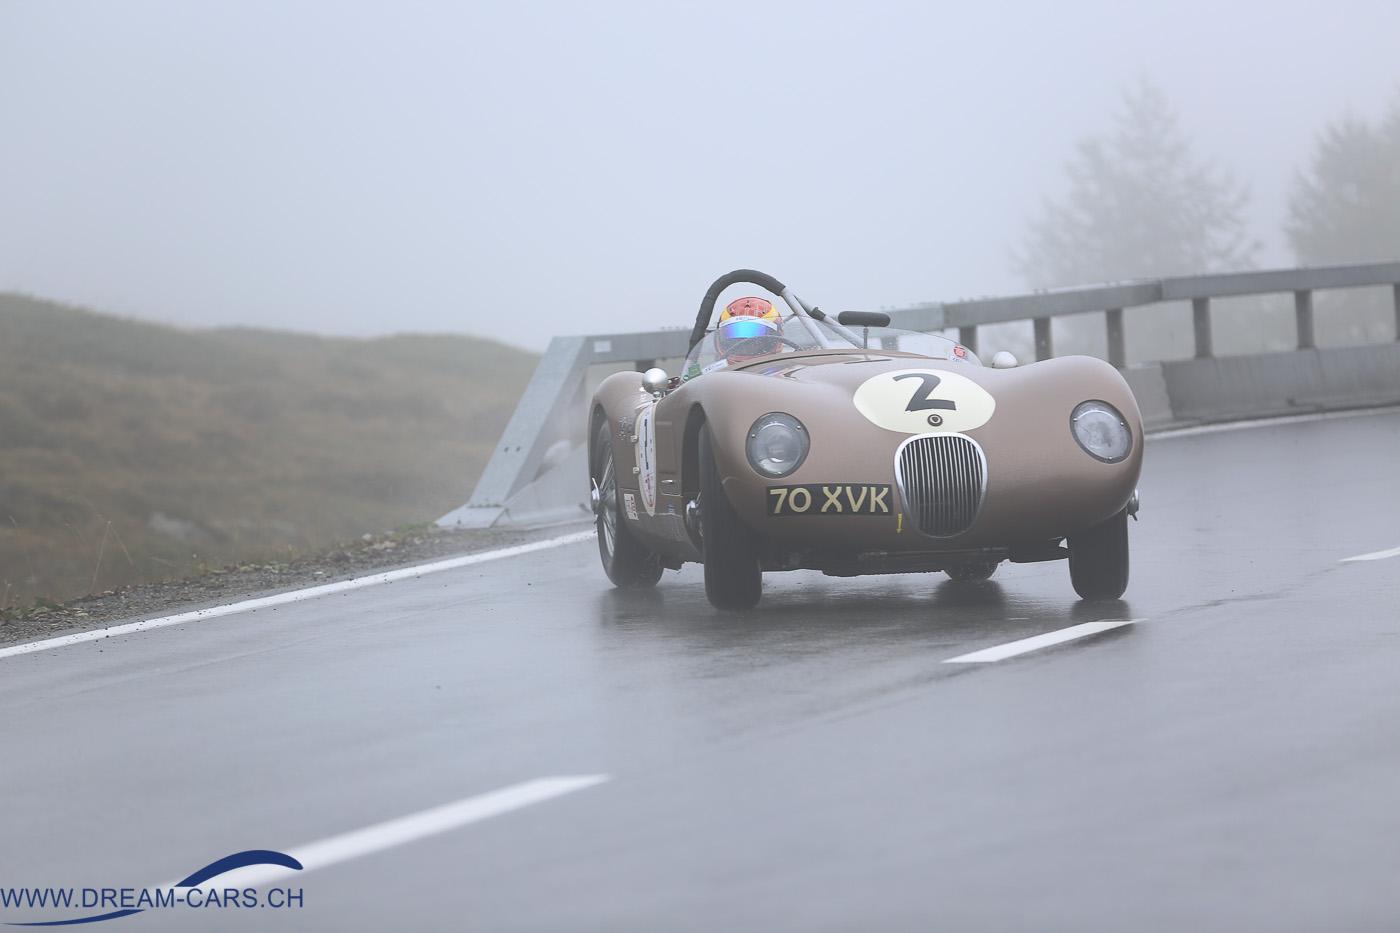 BERNINA GRAN TURISMO 2016. Chris Ward mit dem ex-Fangio Jaguar C-Type driftet spektakulär zum Posten 17